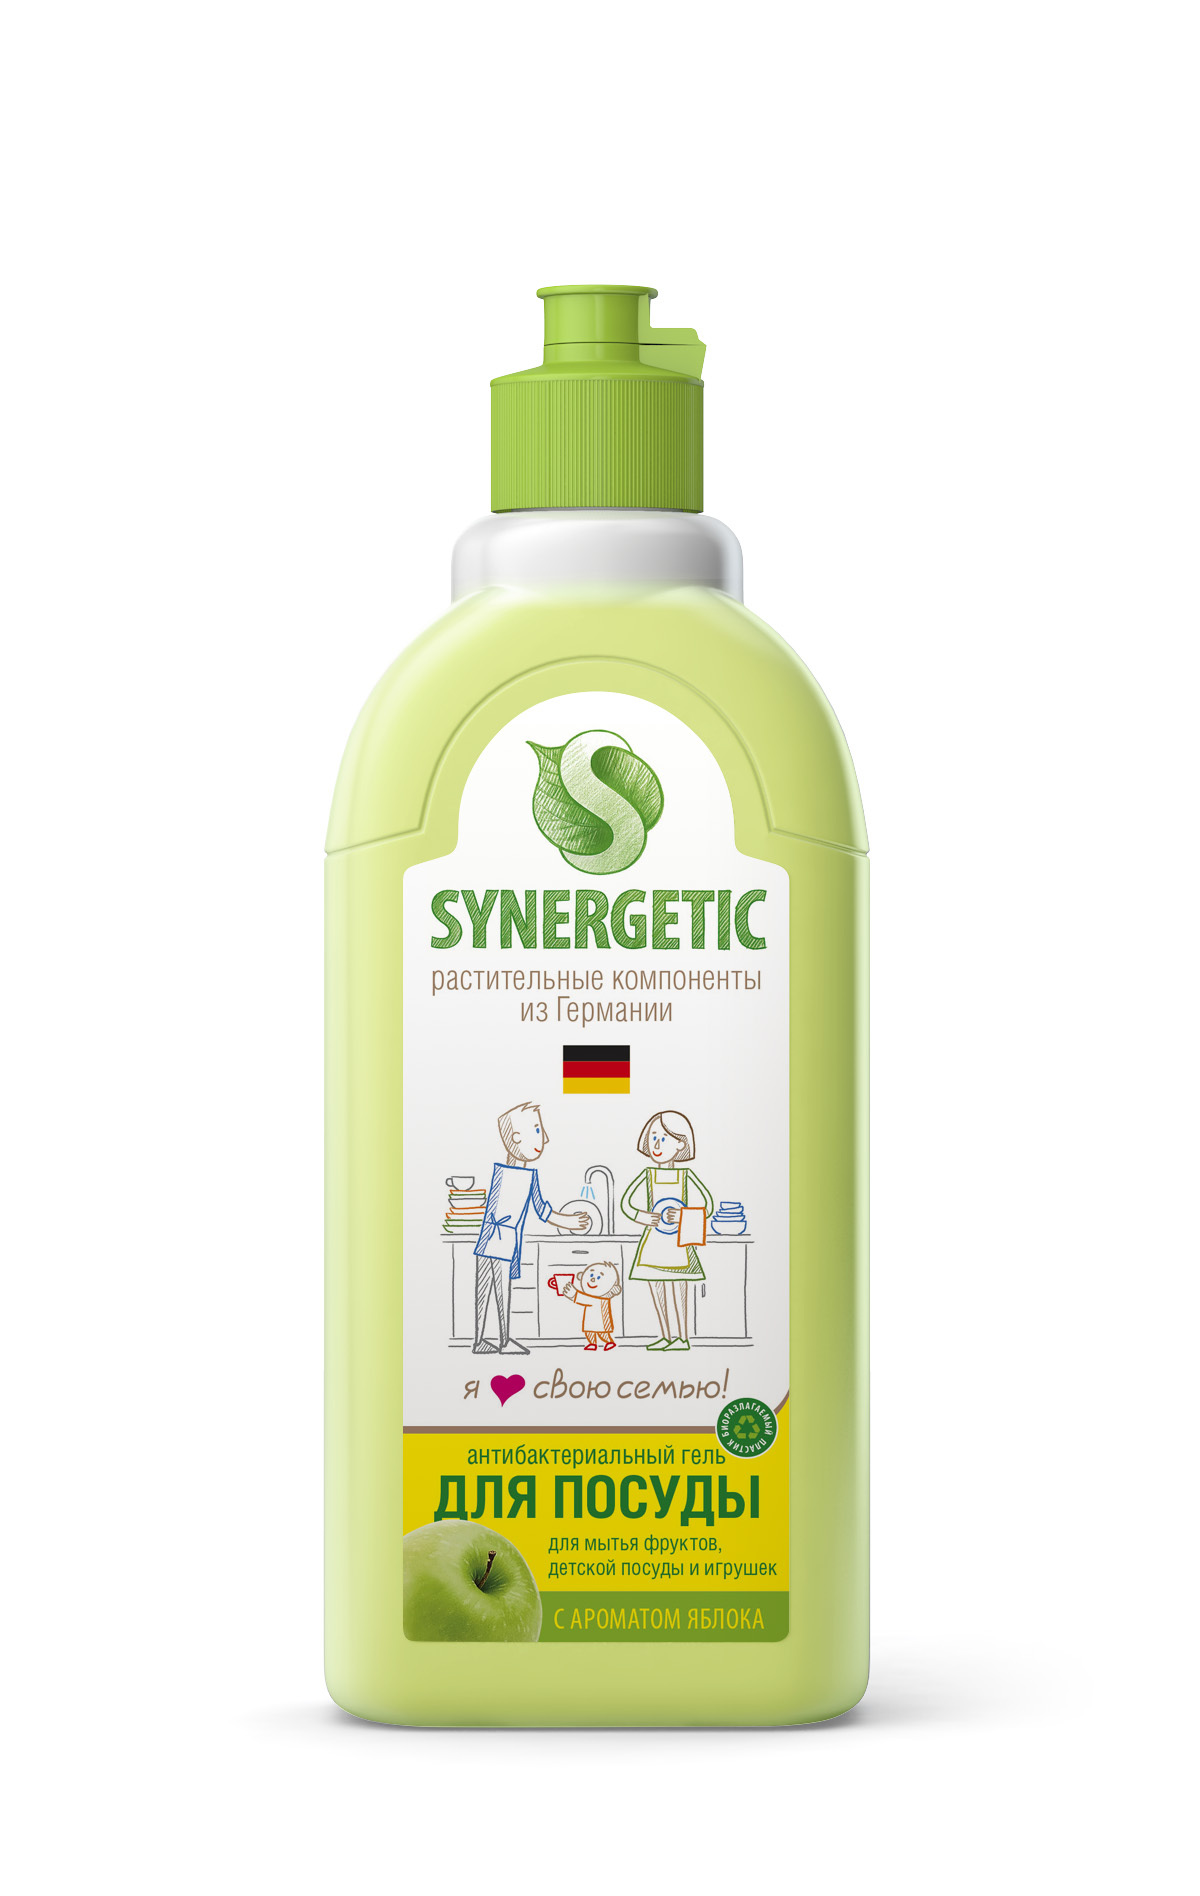 Средство для мытья посуды с ароматом яблока (флакон 0,5 литр флиптоп) SYNERGETIC